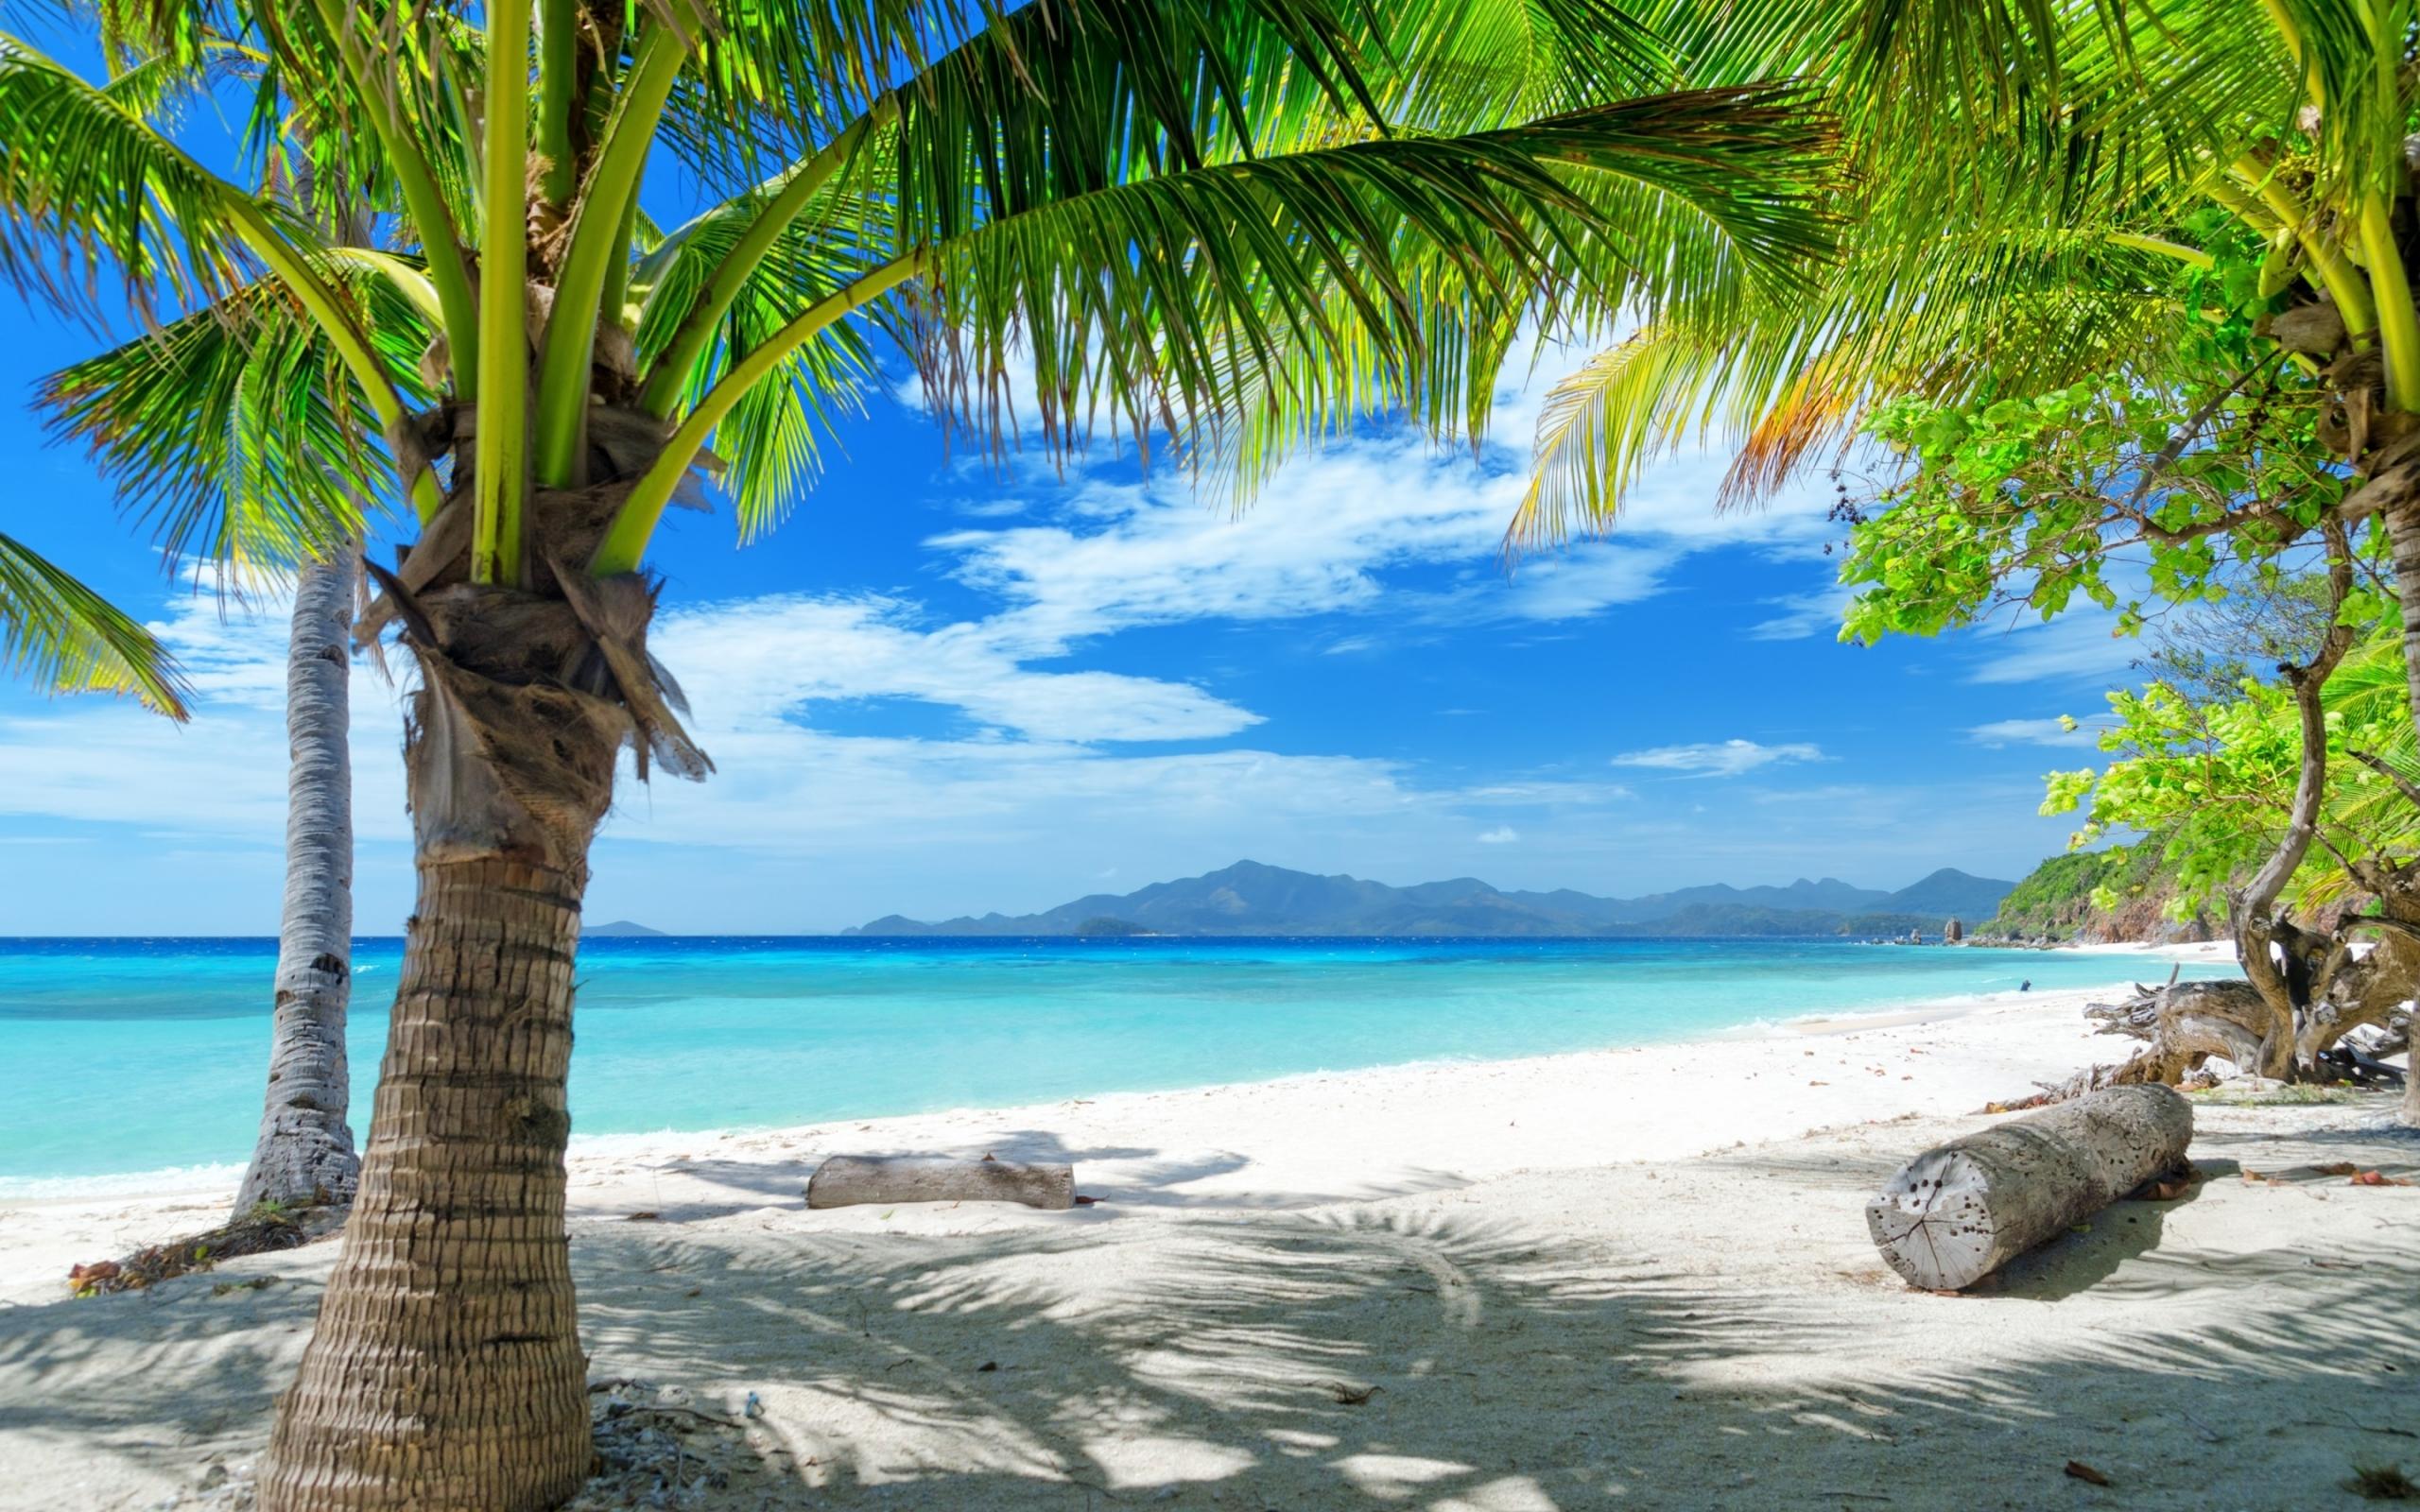 Tempting ocean beach with palm trees HD Desktop Wallpaper HD Desktop 2560x1600